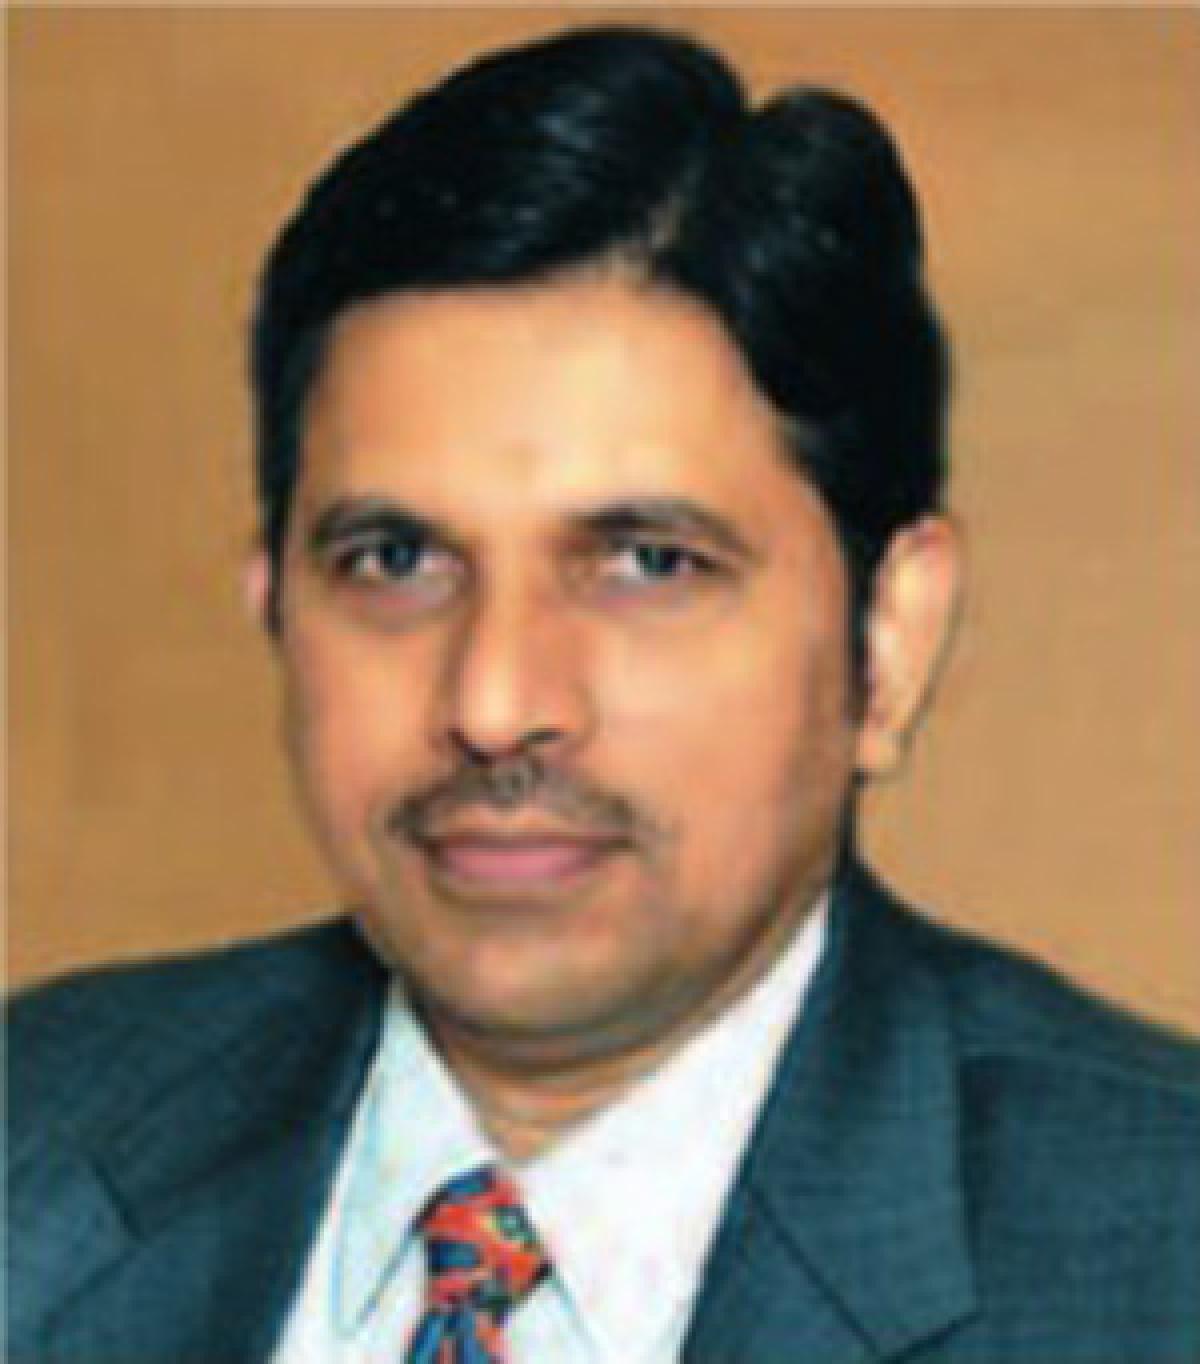 'Prepare students for jobs of tomorrow' -Dr Suhas Pednekar, Principal, R N Ruia College